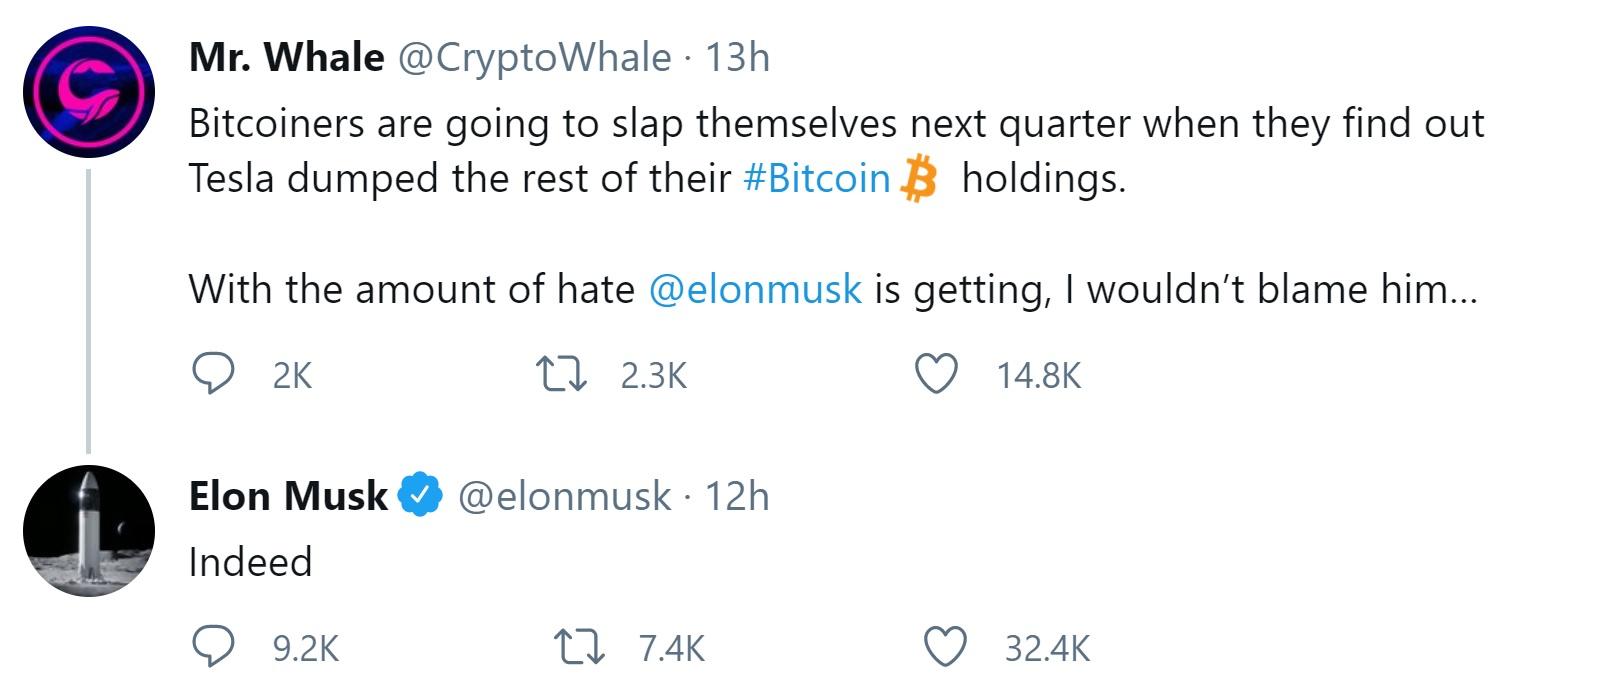 Elon Musk Discloses 'Tesla Has Not Sold Any Bitcoin'